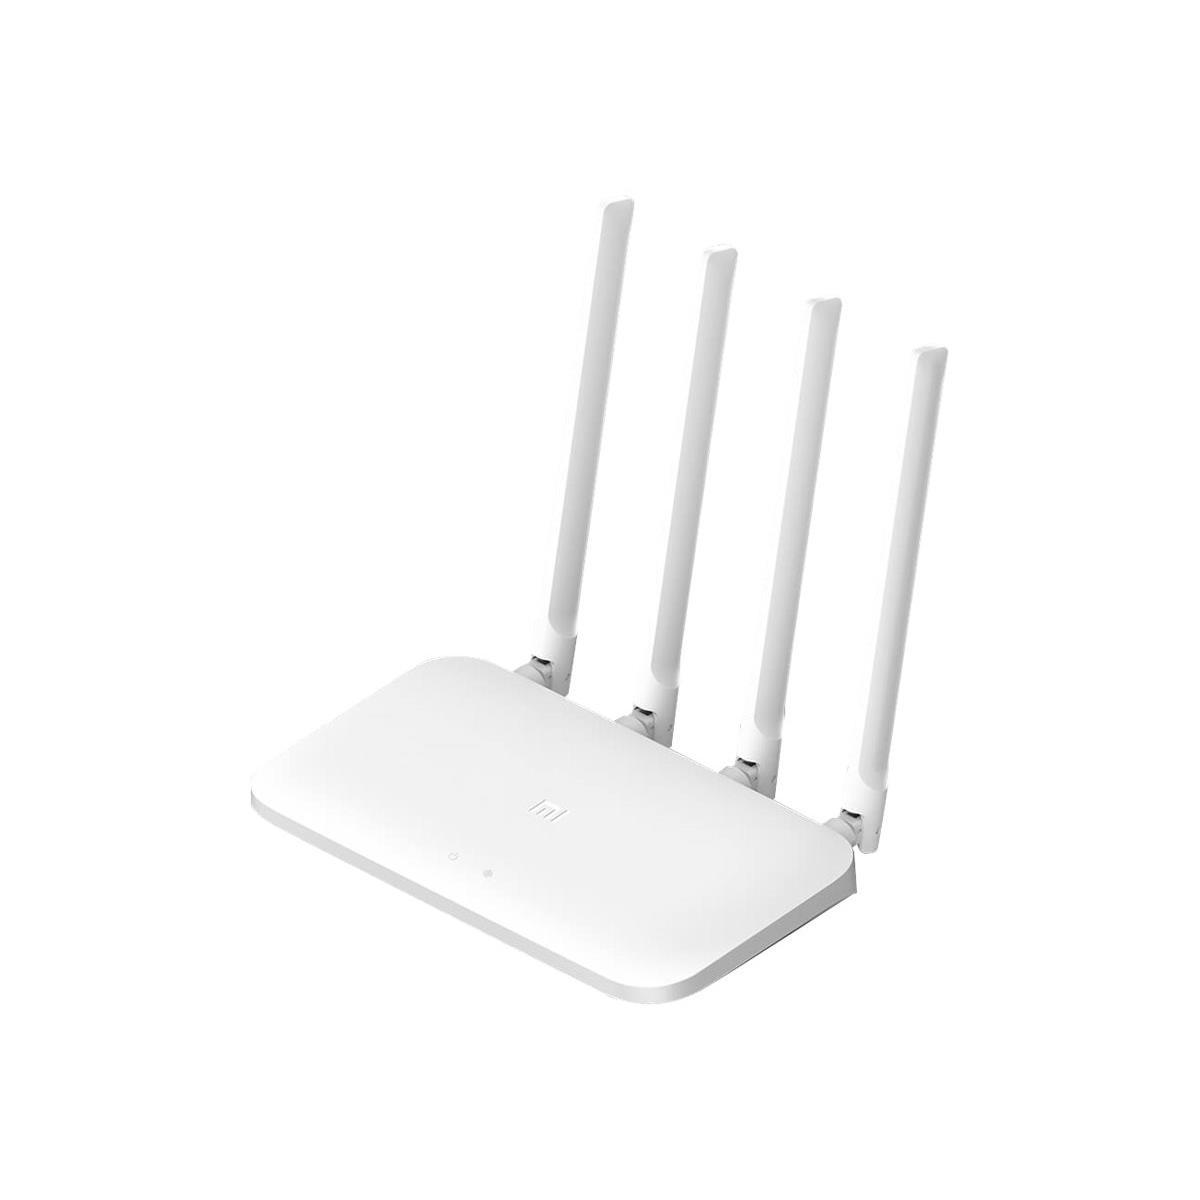 Xiaomi Mi Router 4A AC1200 WLAN Router Dual Band 2.4GHz und 5 GHz WiFi,Xiaomi ,DVB4230GL, 6970244525536